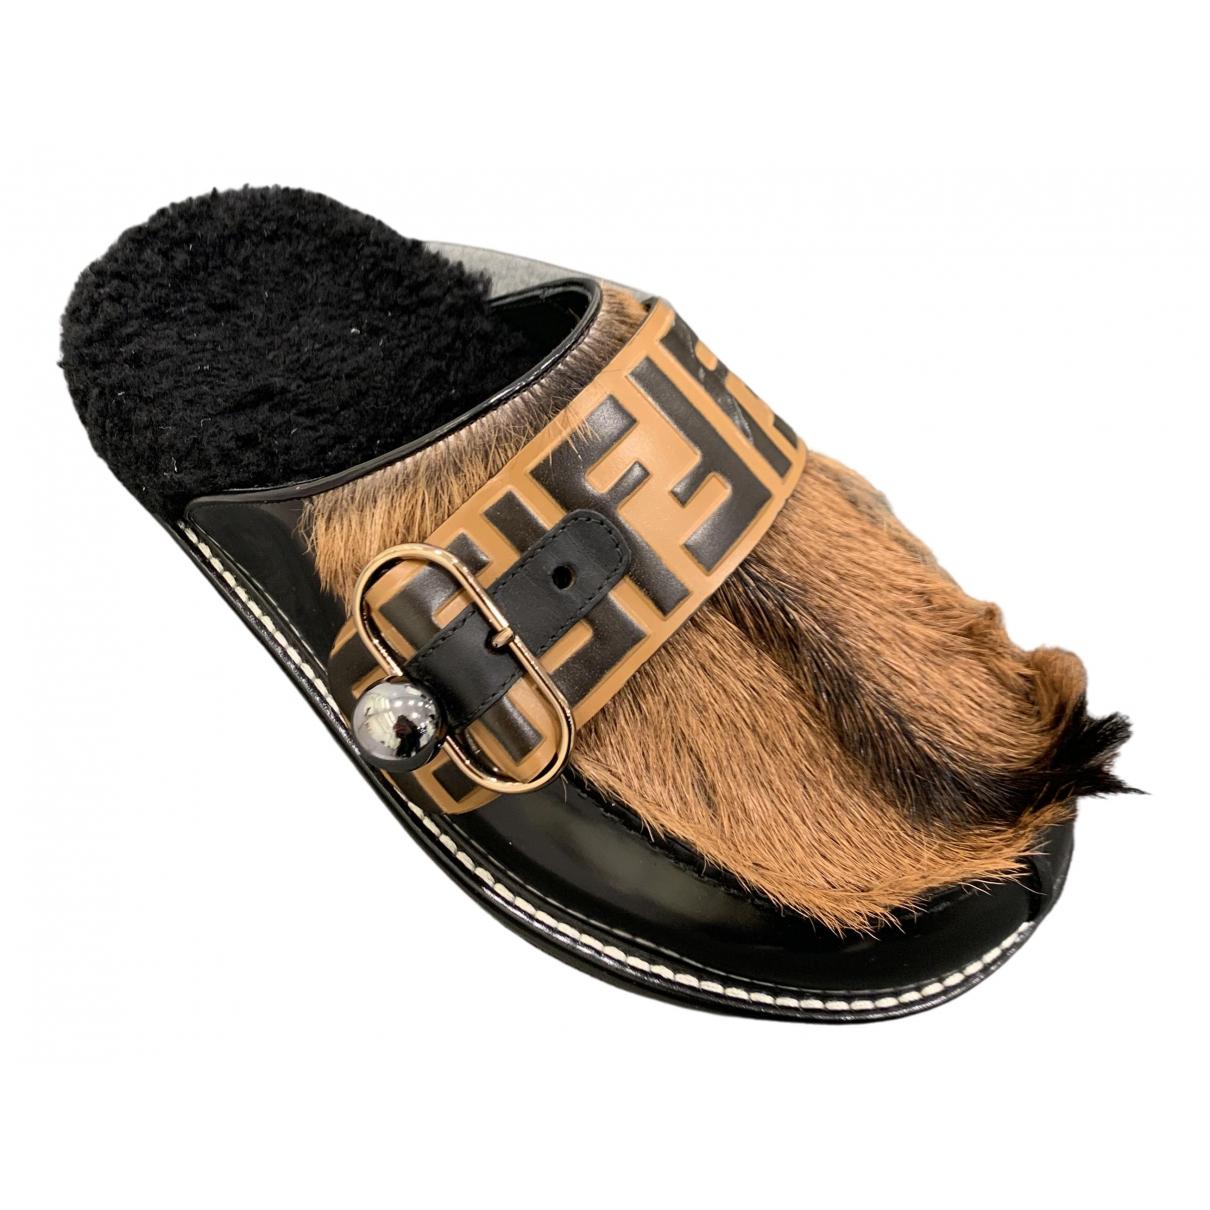 Fendi N Brown Pony-style calfskin Mules & Clogs for Women 38 EU